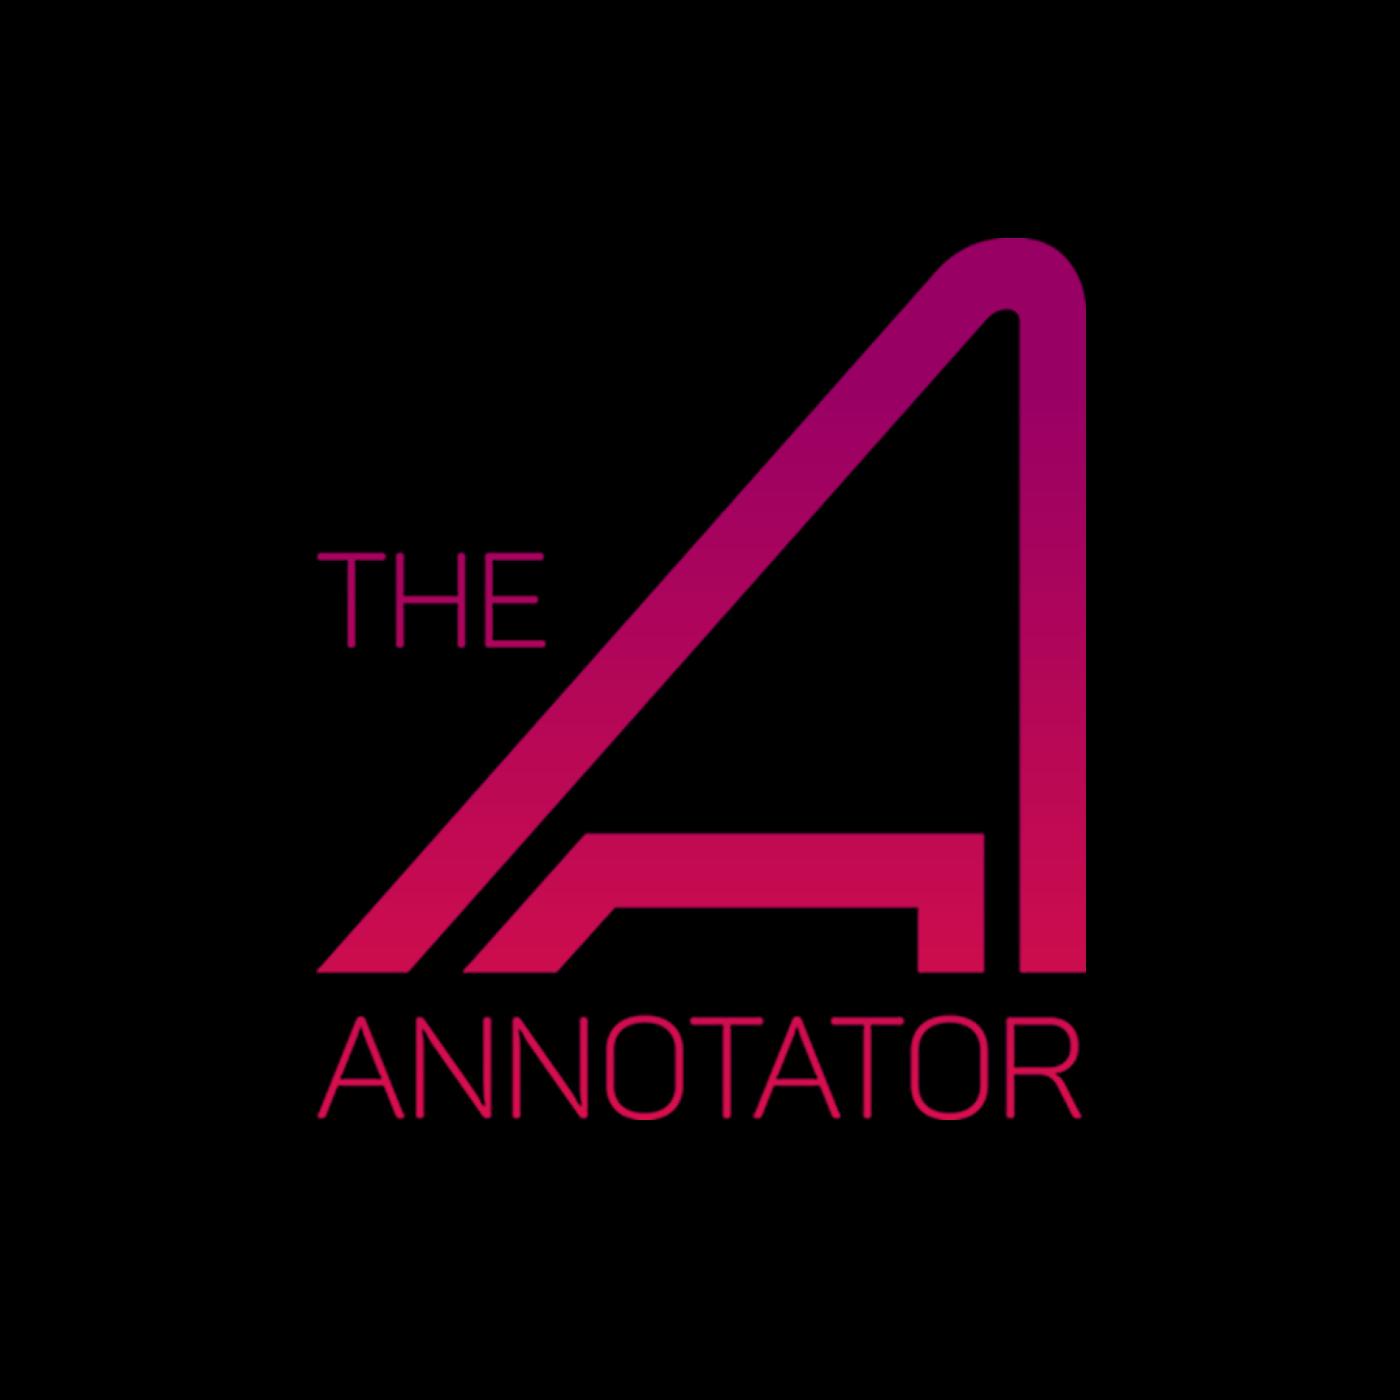 Portfolio Log Podcast Season 10 Episode 4 The Library Of Films  >> The Annotator